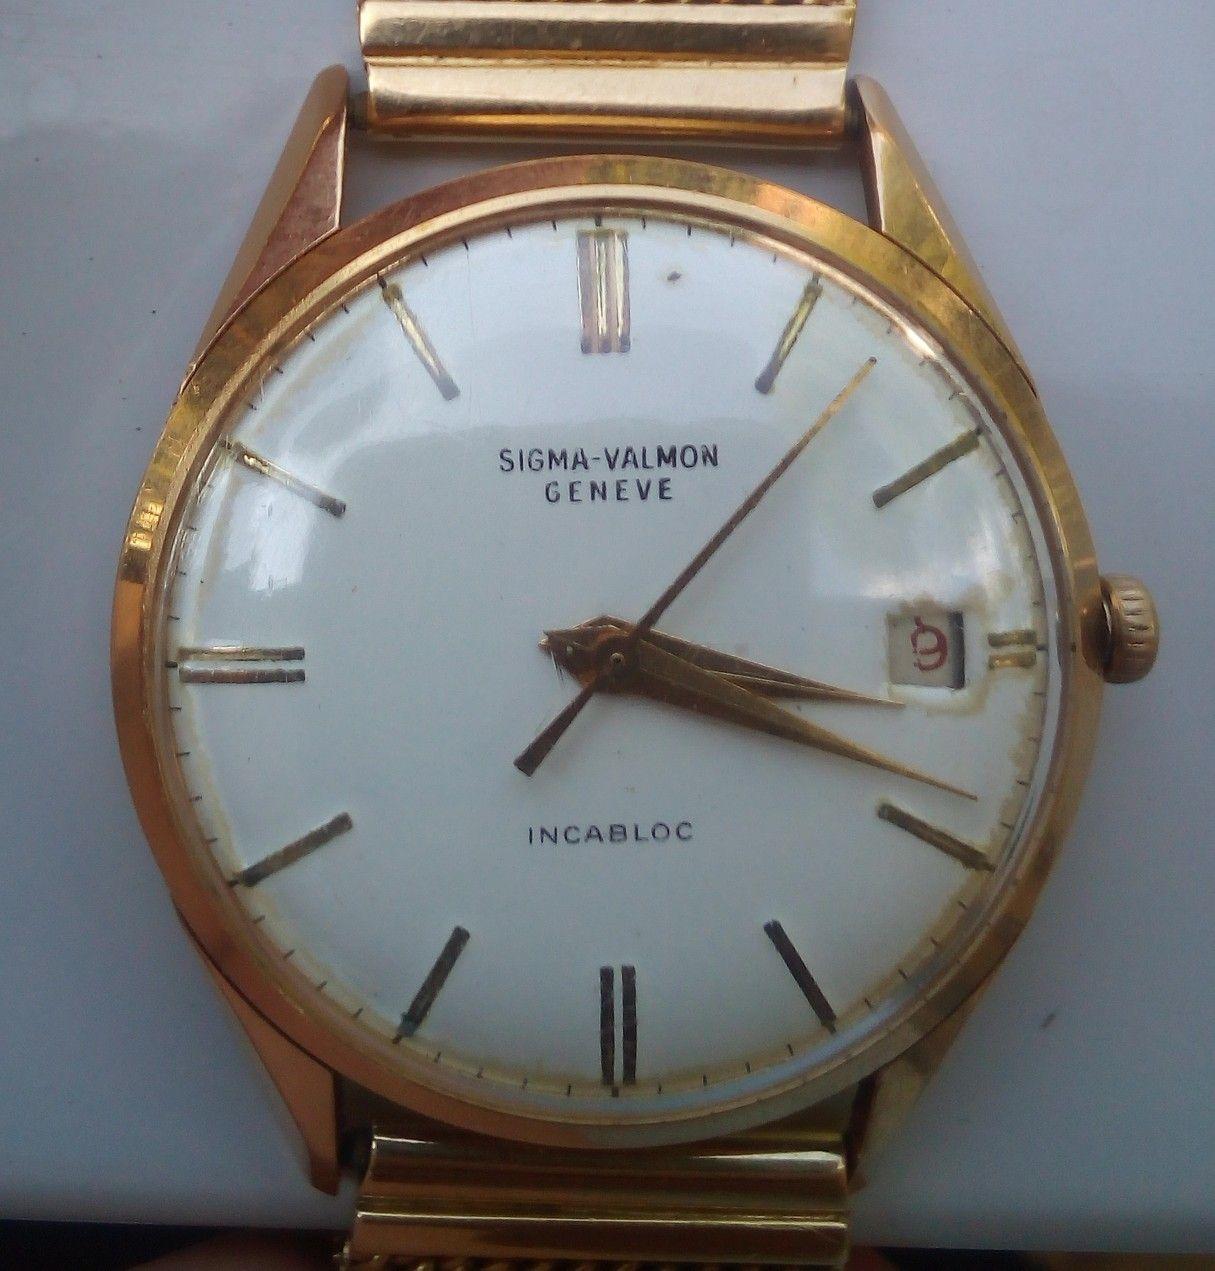 8c5e370bcfcc Sigma-Valmon Genève Manual wrist Incabloc 1960s